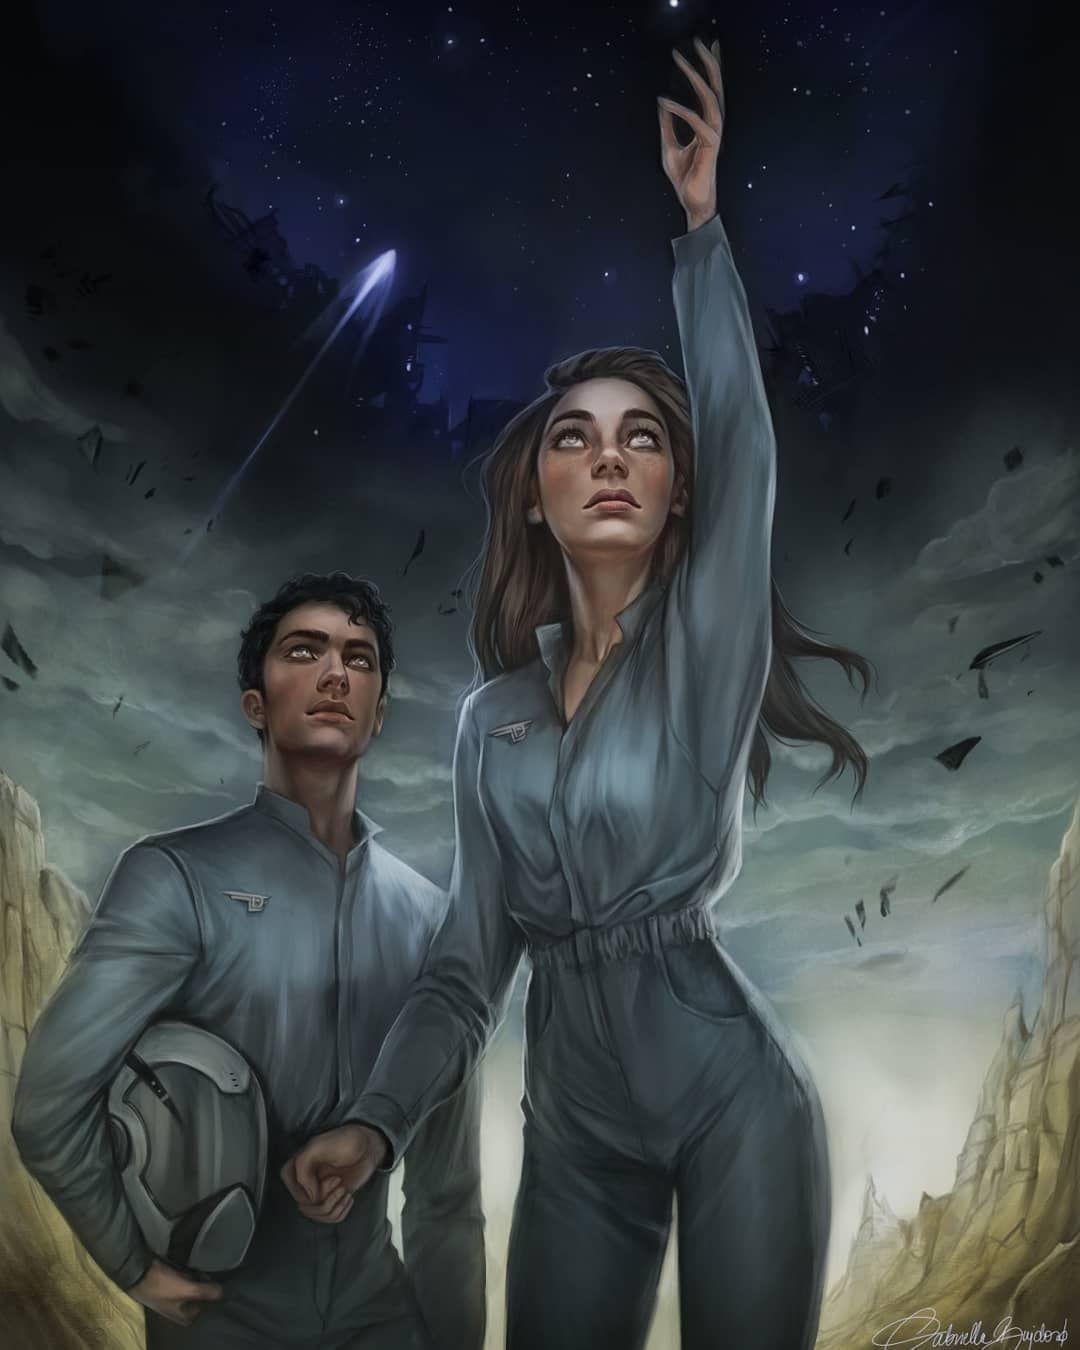 Spensa and Jorgen 🛰 by Gabriella Bujdosó